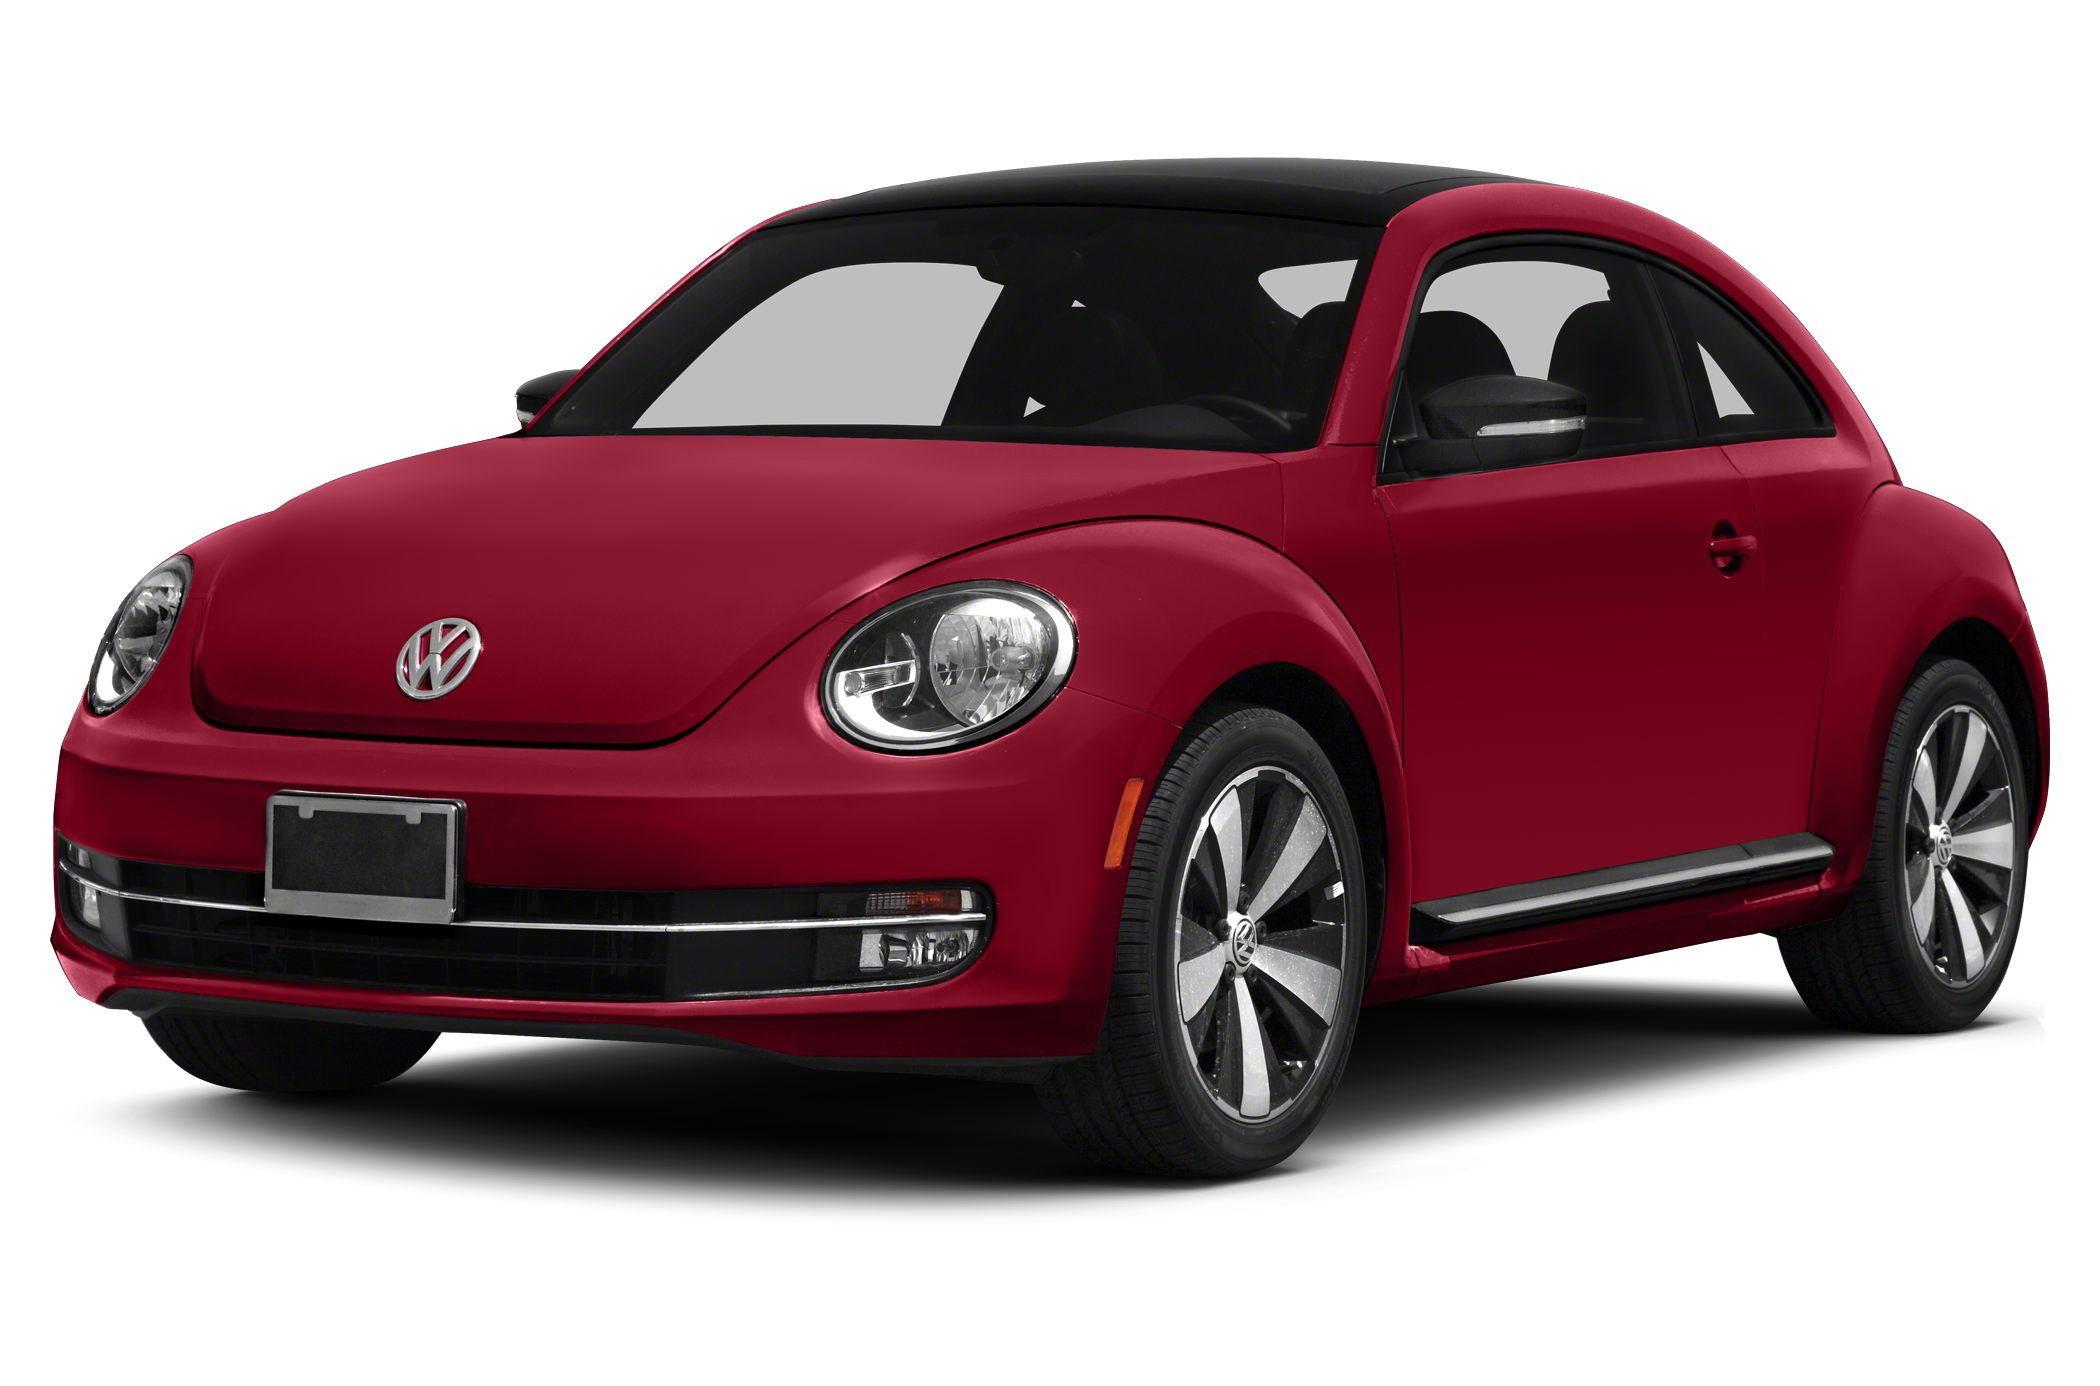 2014 Volkswagen Beetle 1.8T Hatchback for sale in Laurel for $16,495 with 8,640 miles.